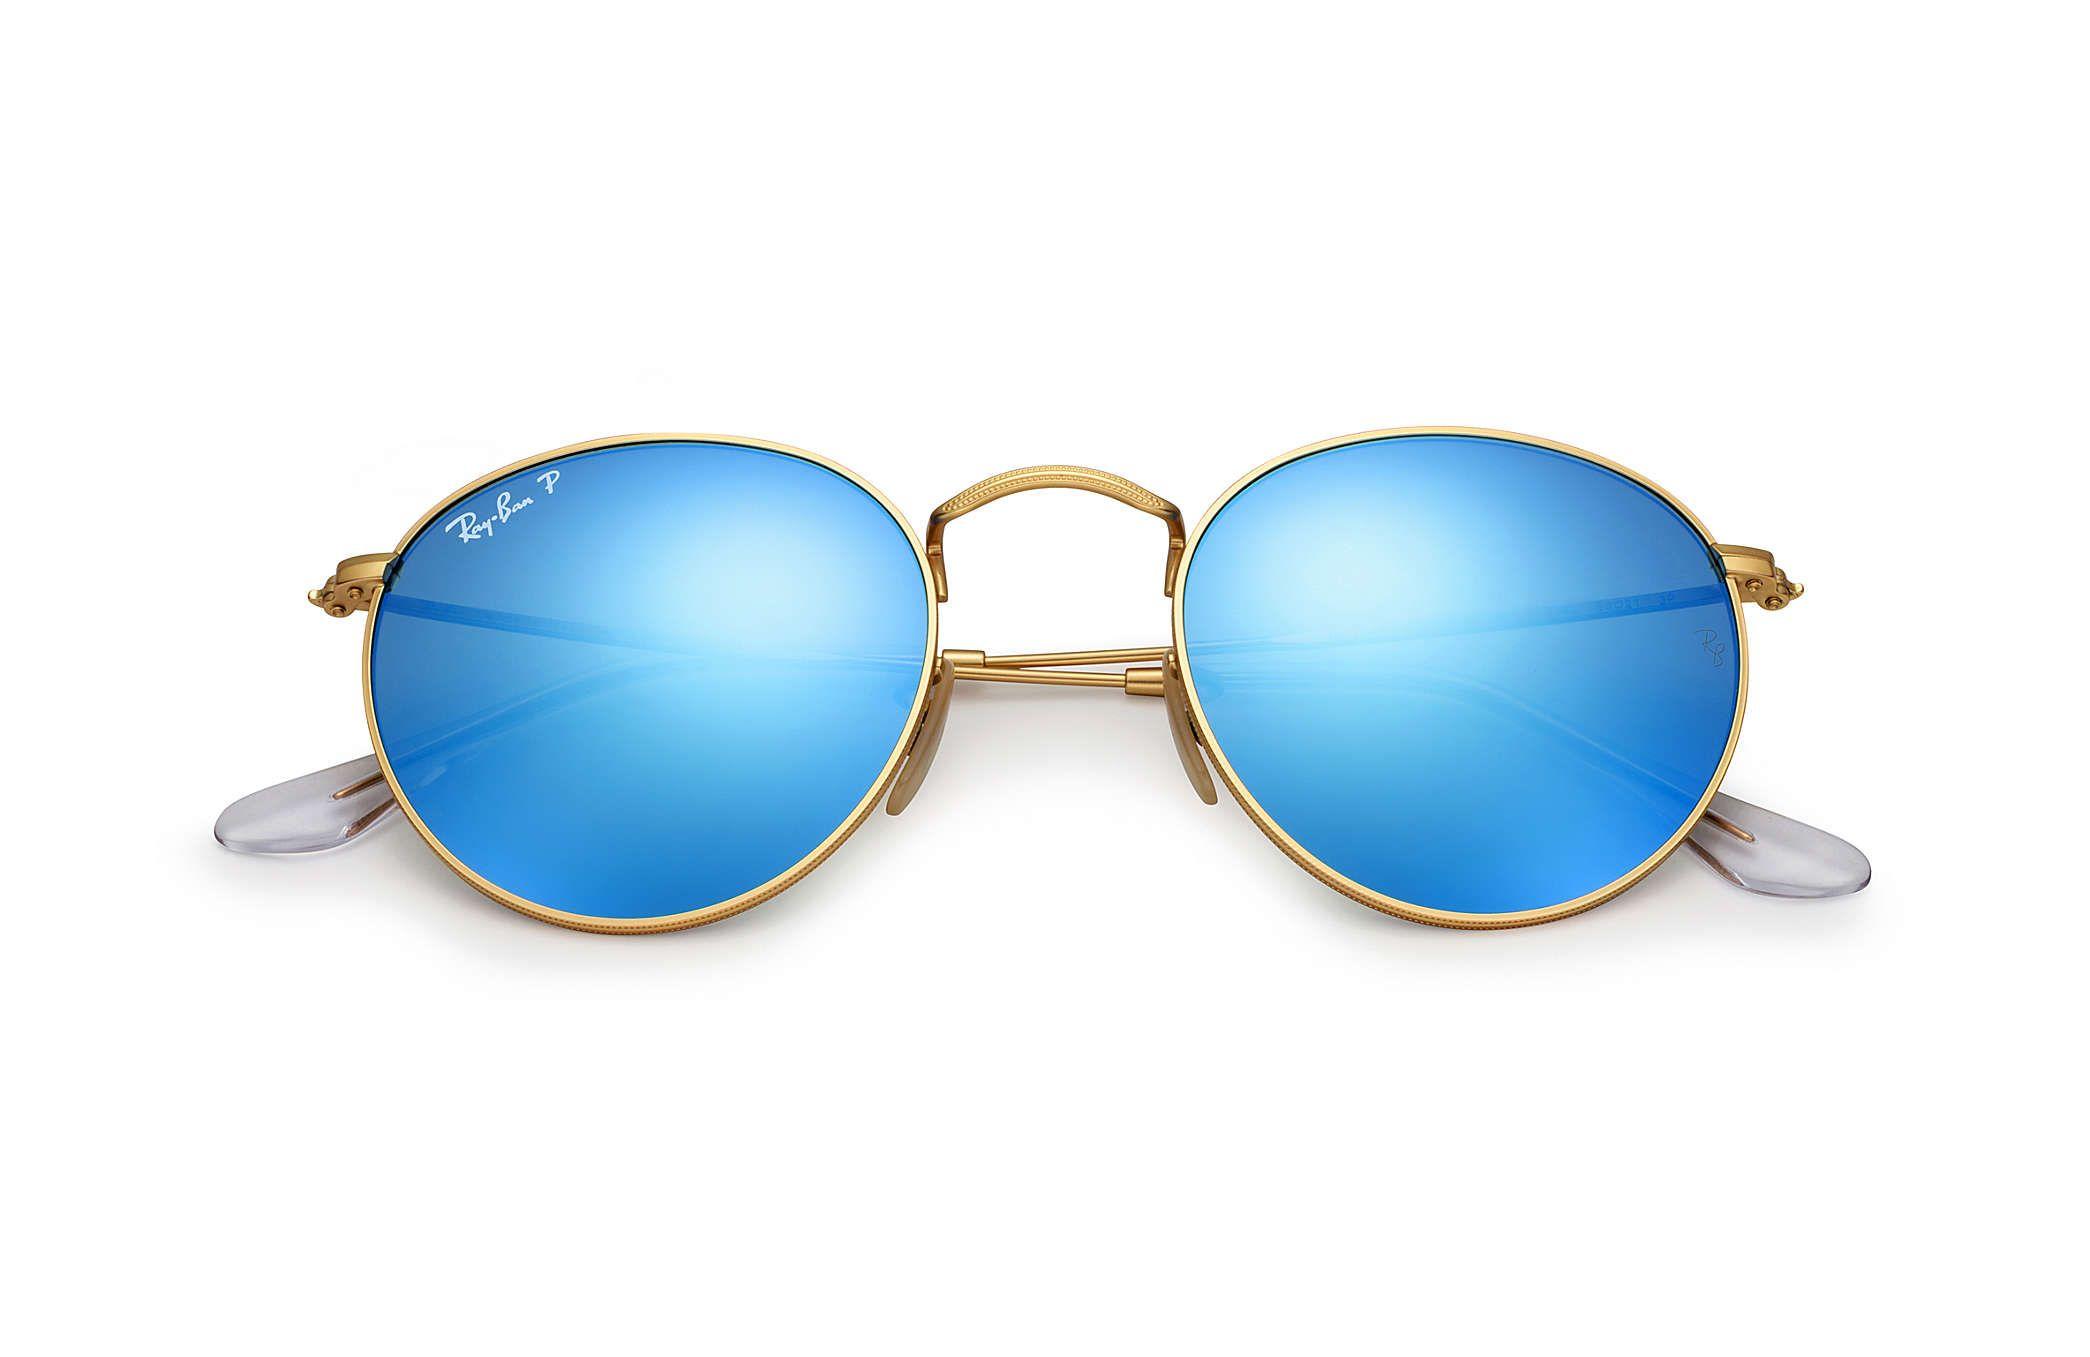 ... sunglasses gold frame 59bf9 6f3c0 store ray ban 0rb3447 round flash  lenses gold sun 5b33e d9102 ... e128c8162de0